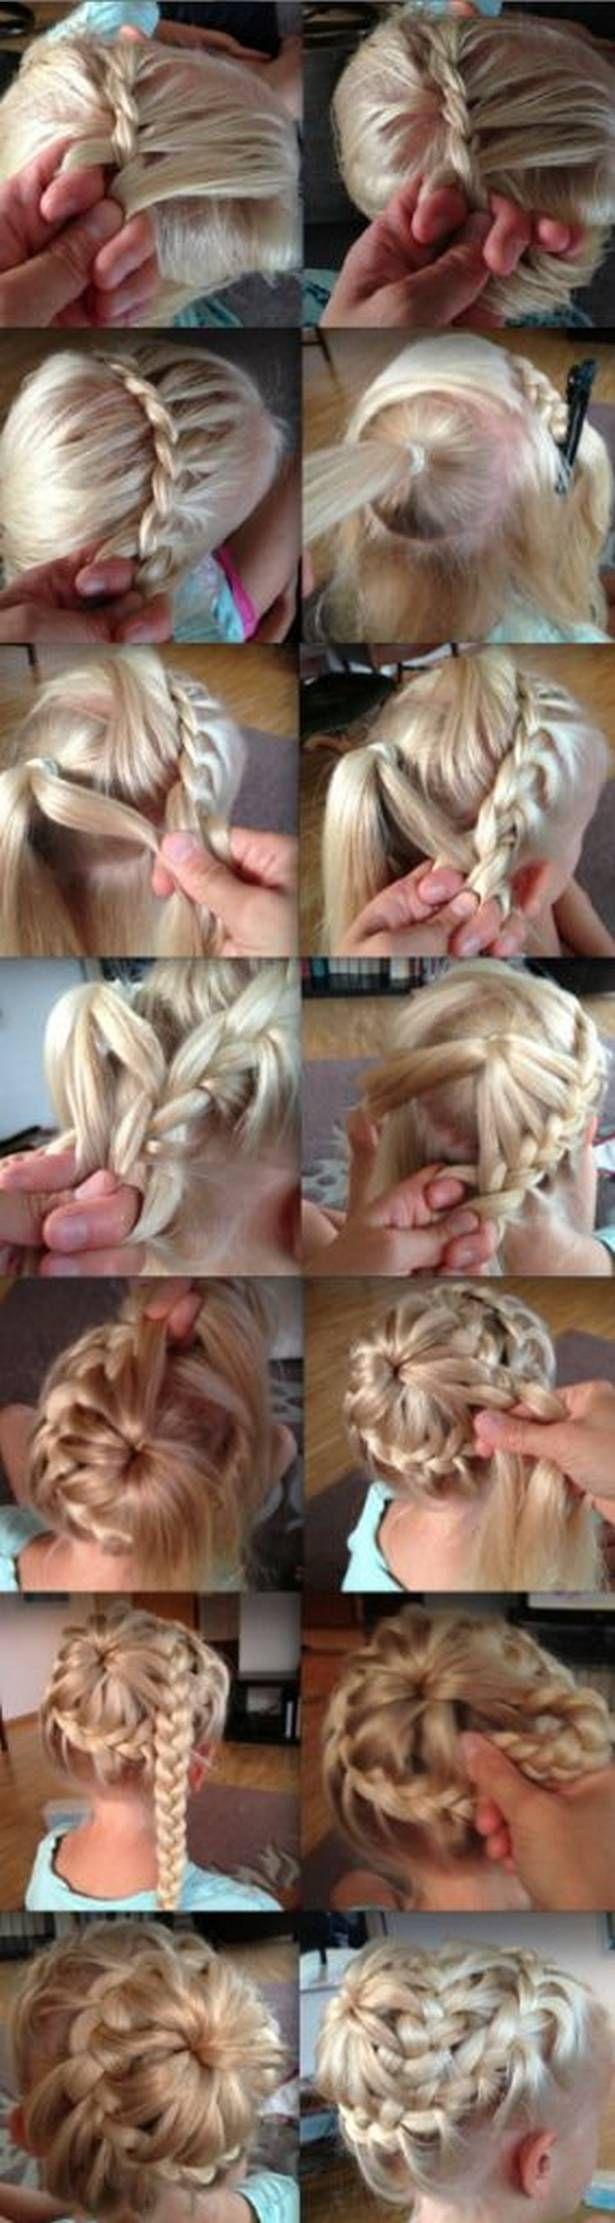 step-by-step-how-to-do-a-starburst-braid